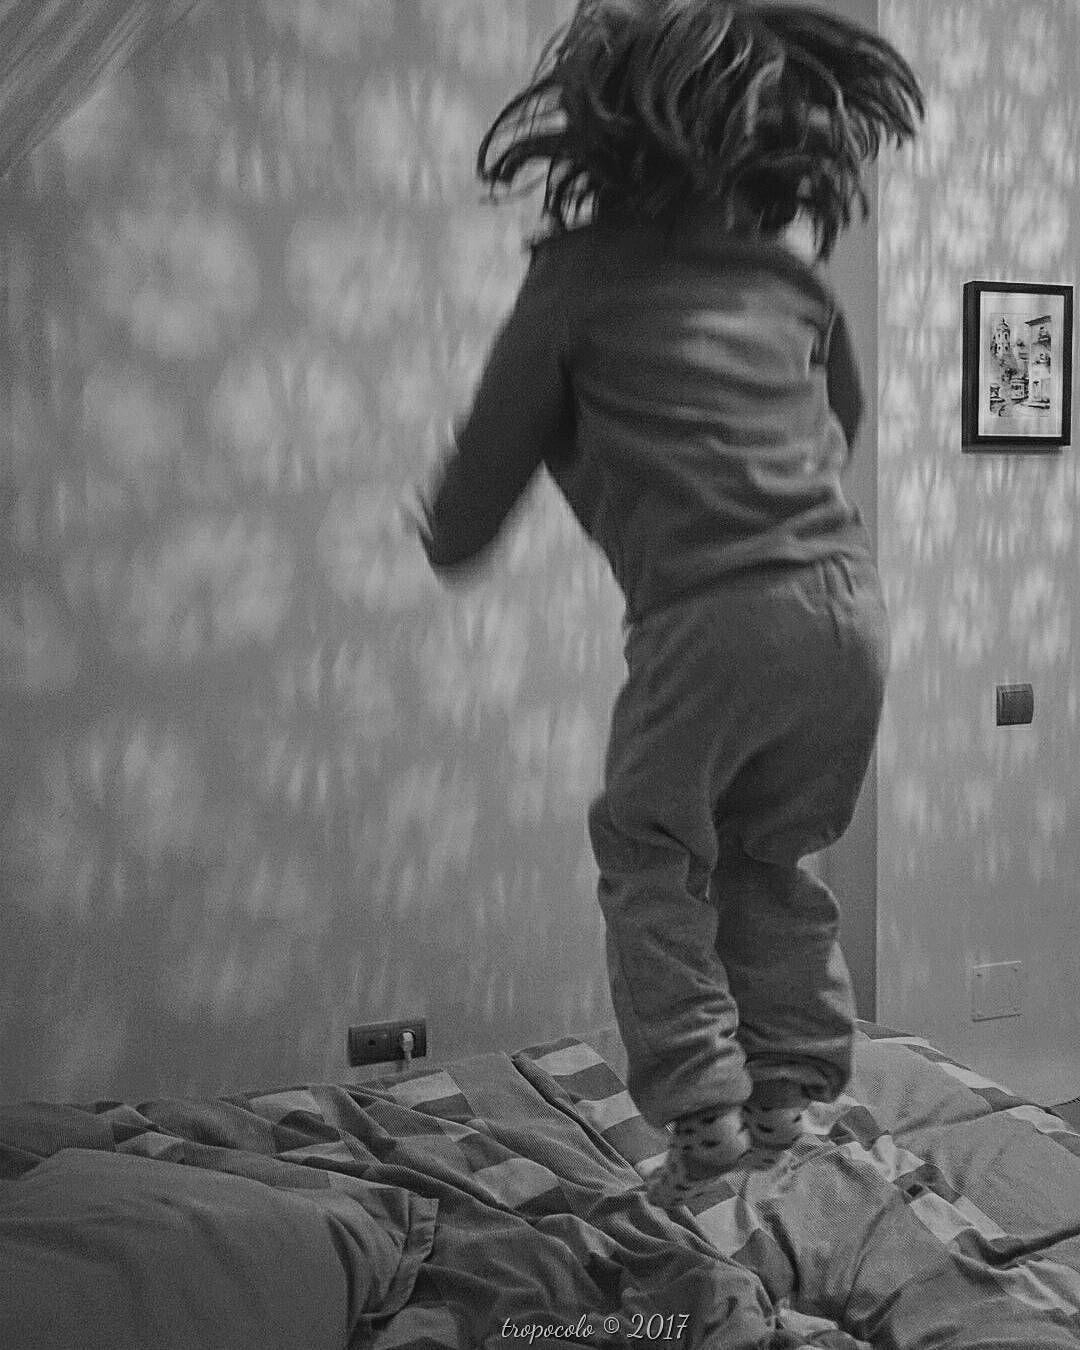 60/365 Go ahead and jump #criandoEnByN #vanHalen #jump #pequeMayor #girl #instagood #instakids #kids  #vsco #vscogood #vscogrid #vscohub #vscocam  #bnw_life  #sony #sonyA7 #A7 #sonyCamera #sonyAlpha #Alpha #alphaCamera #blackandwhitephoto #igersbnw #humonegrophoto #blackandwhite #blackandwhitephotography #love #family #life #photoshoot -------------------------------------------------- Todos los derechos reservados  tropocolo 2017